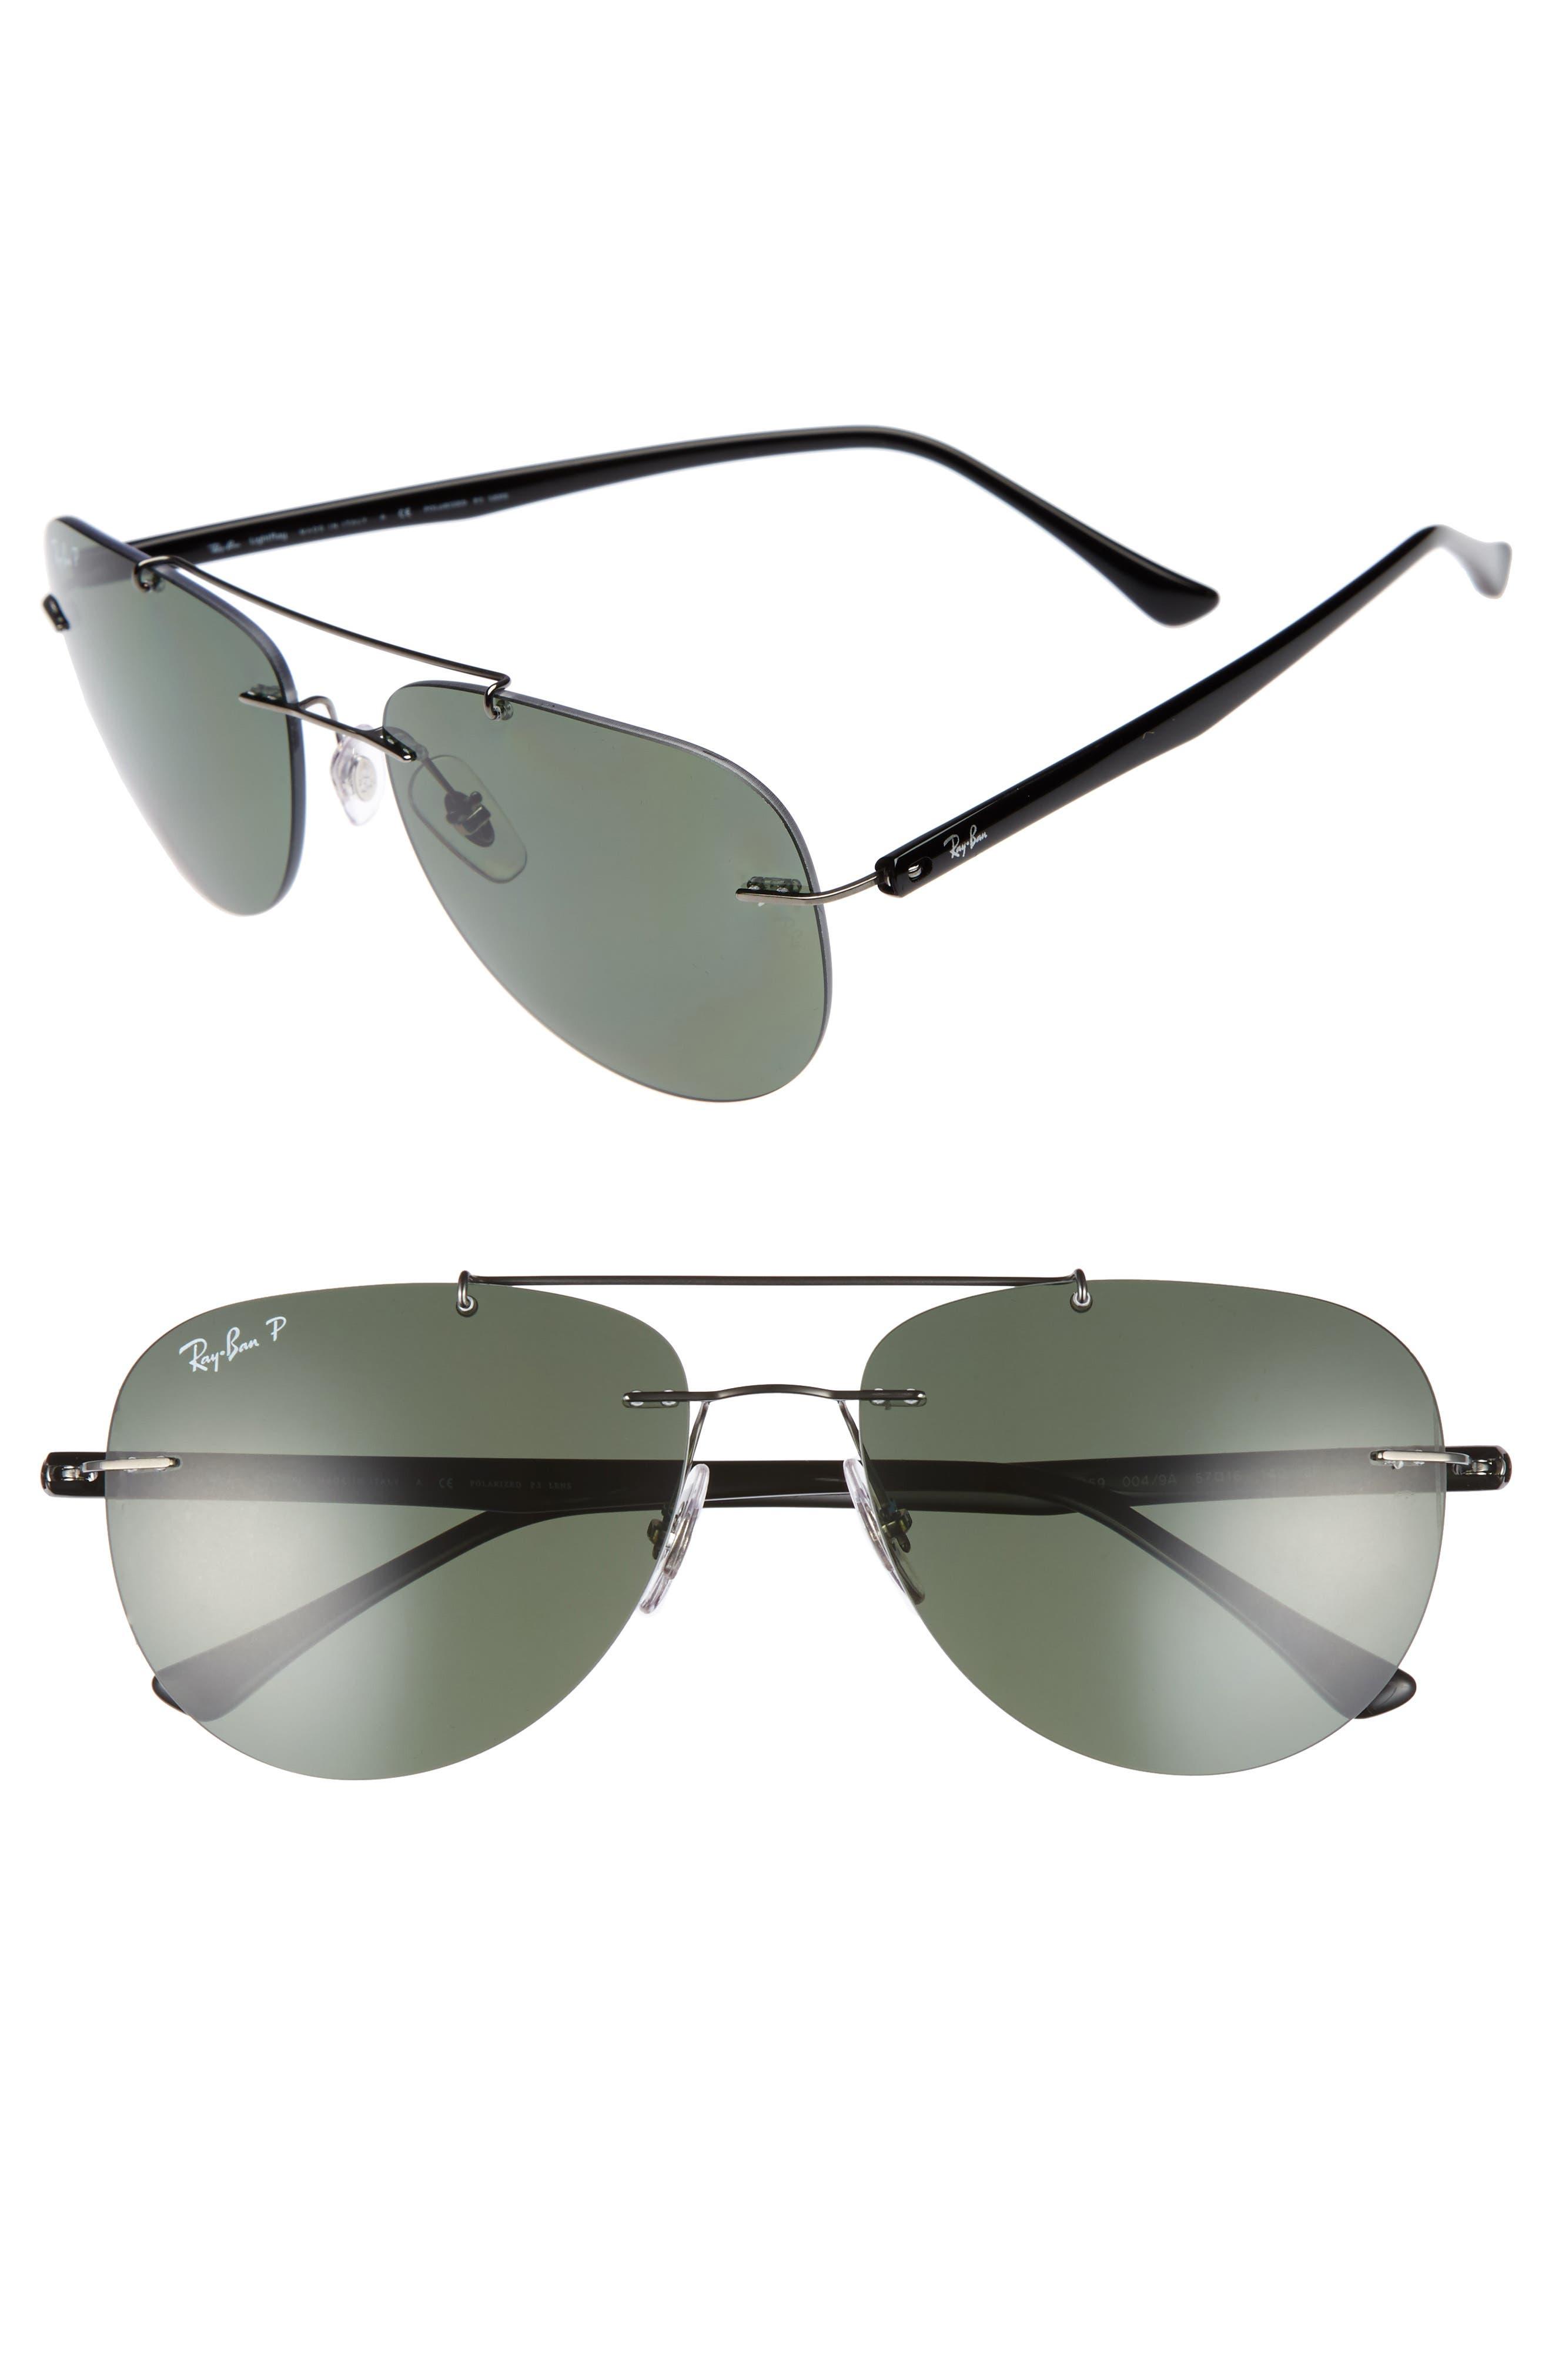 Phantos 57mm Polarized Rimless Aviator Sunglasses,                             Main thumbnail 1, color,                             020